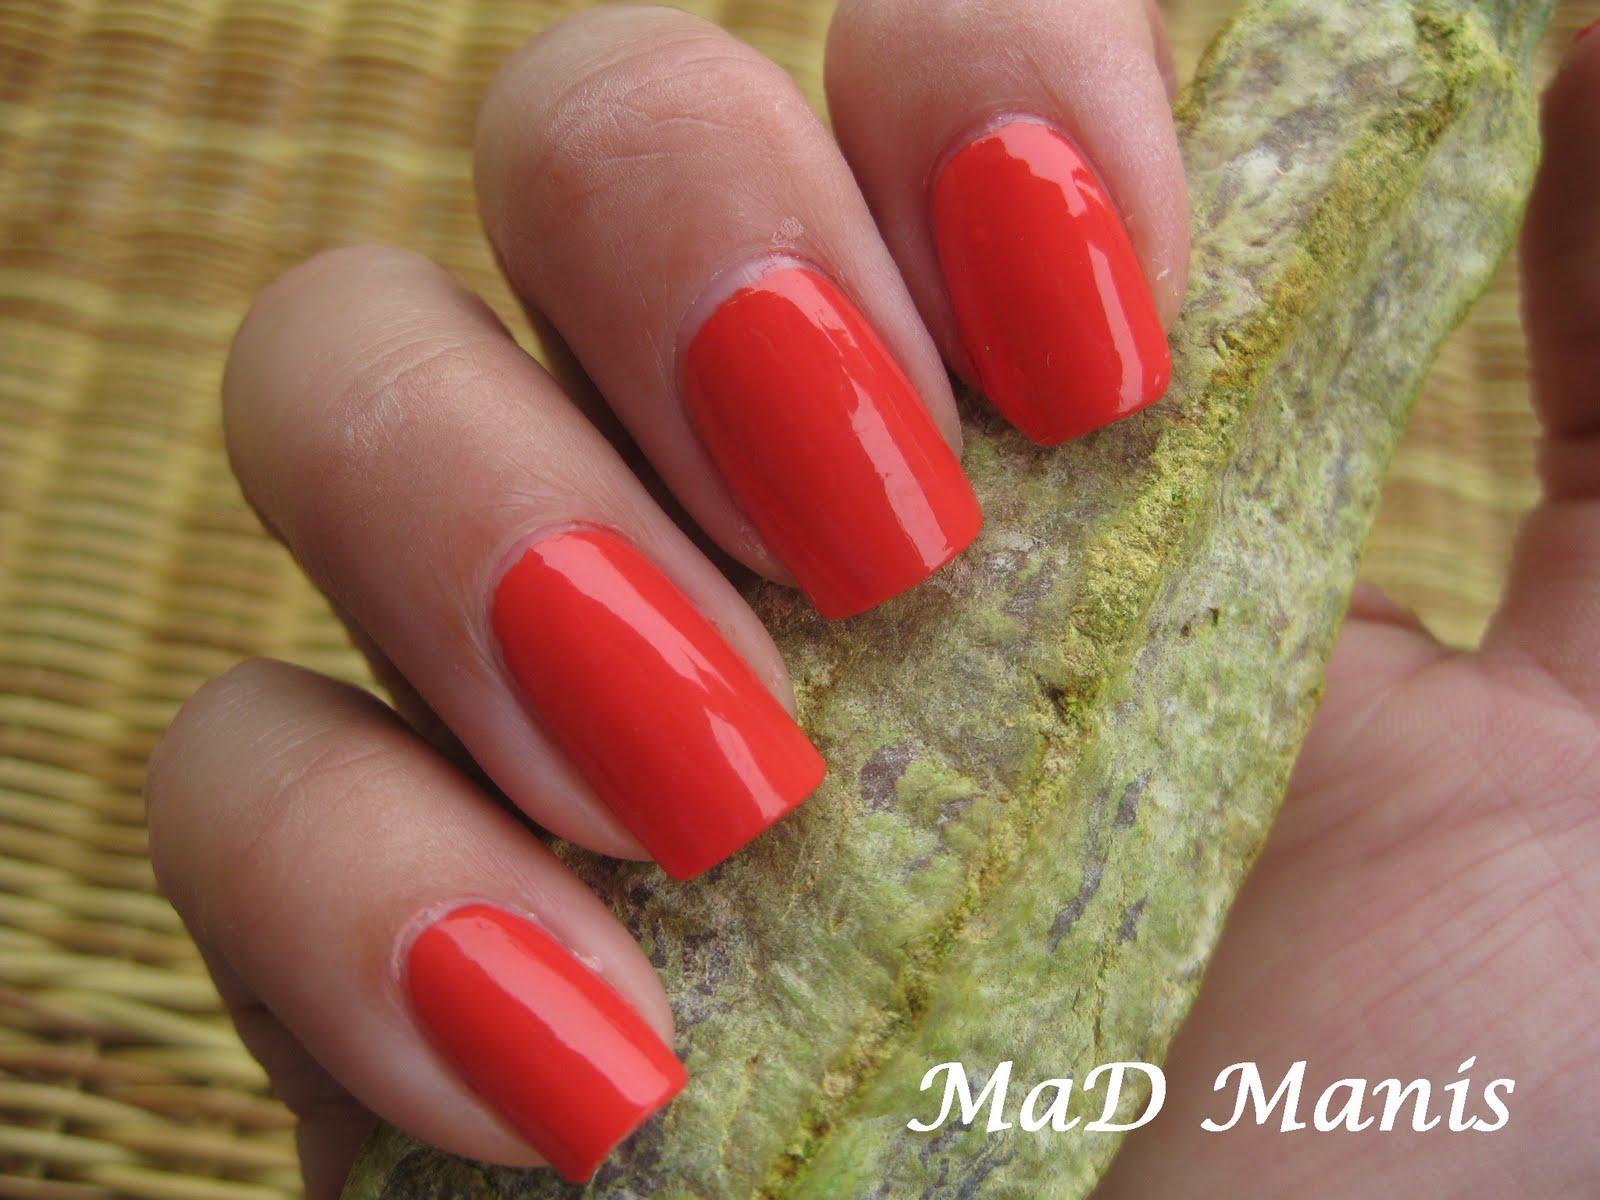 MaD Manis: Sally Hansen Kook A Mango